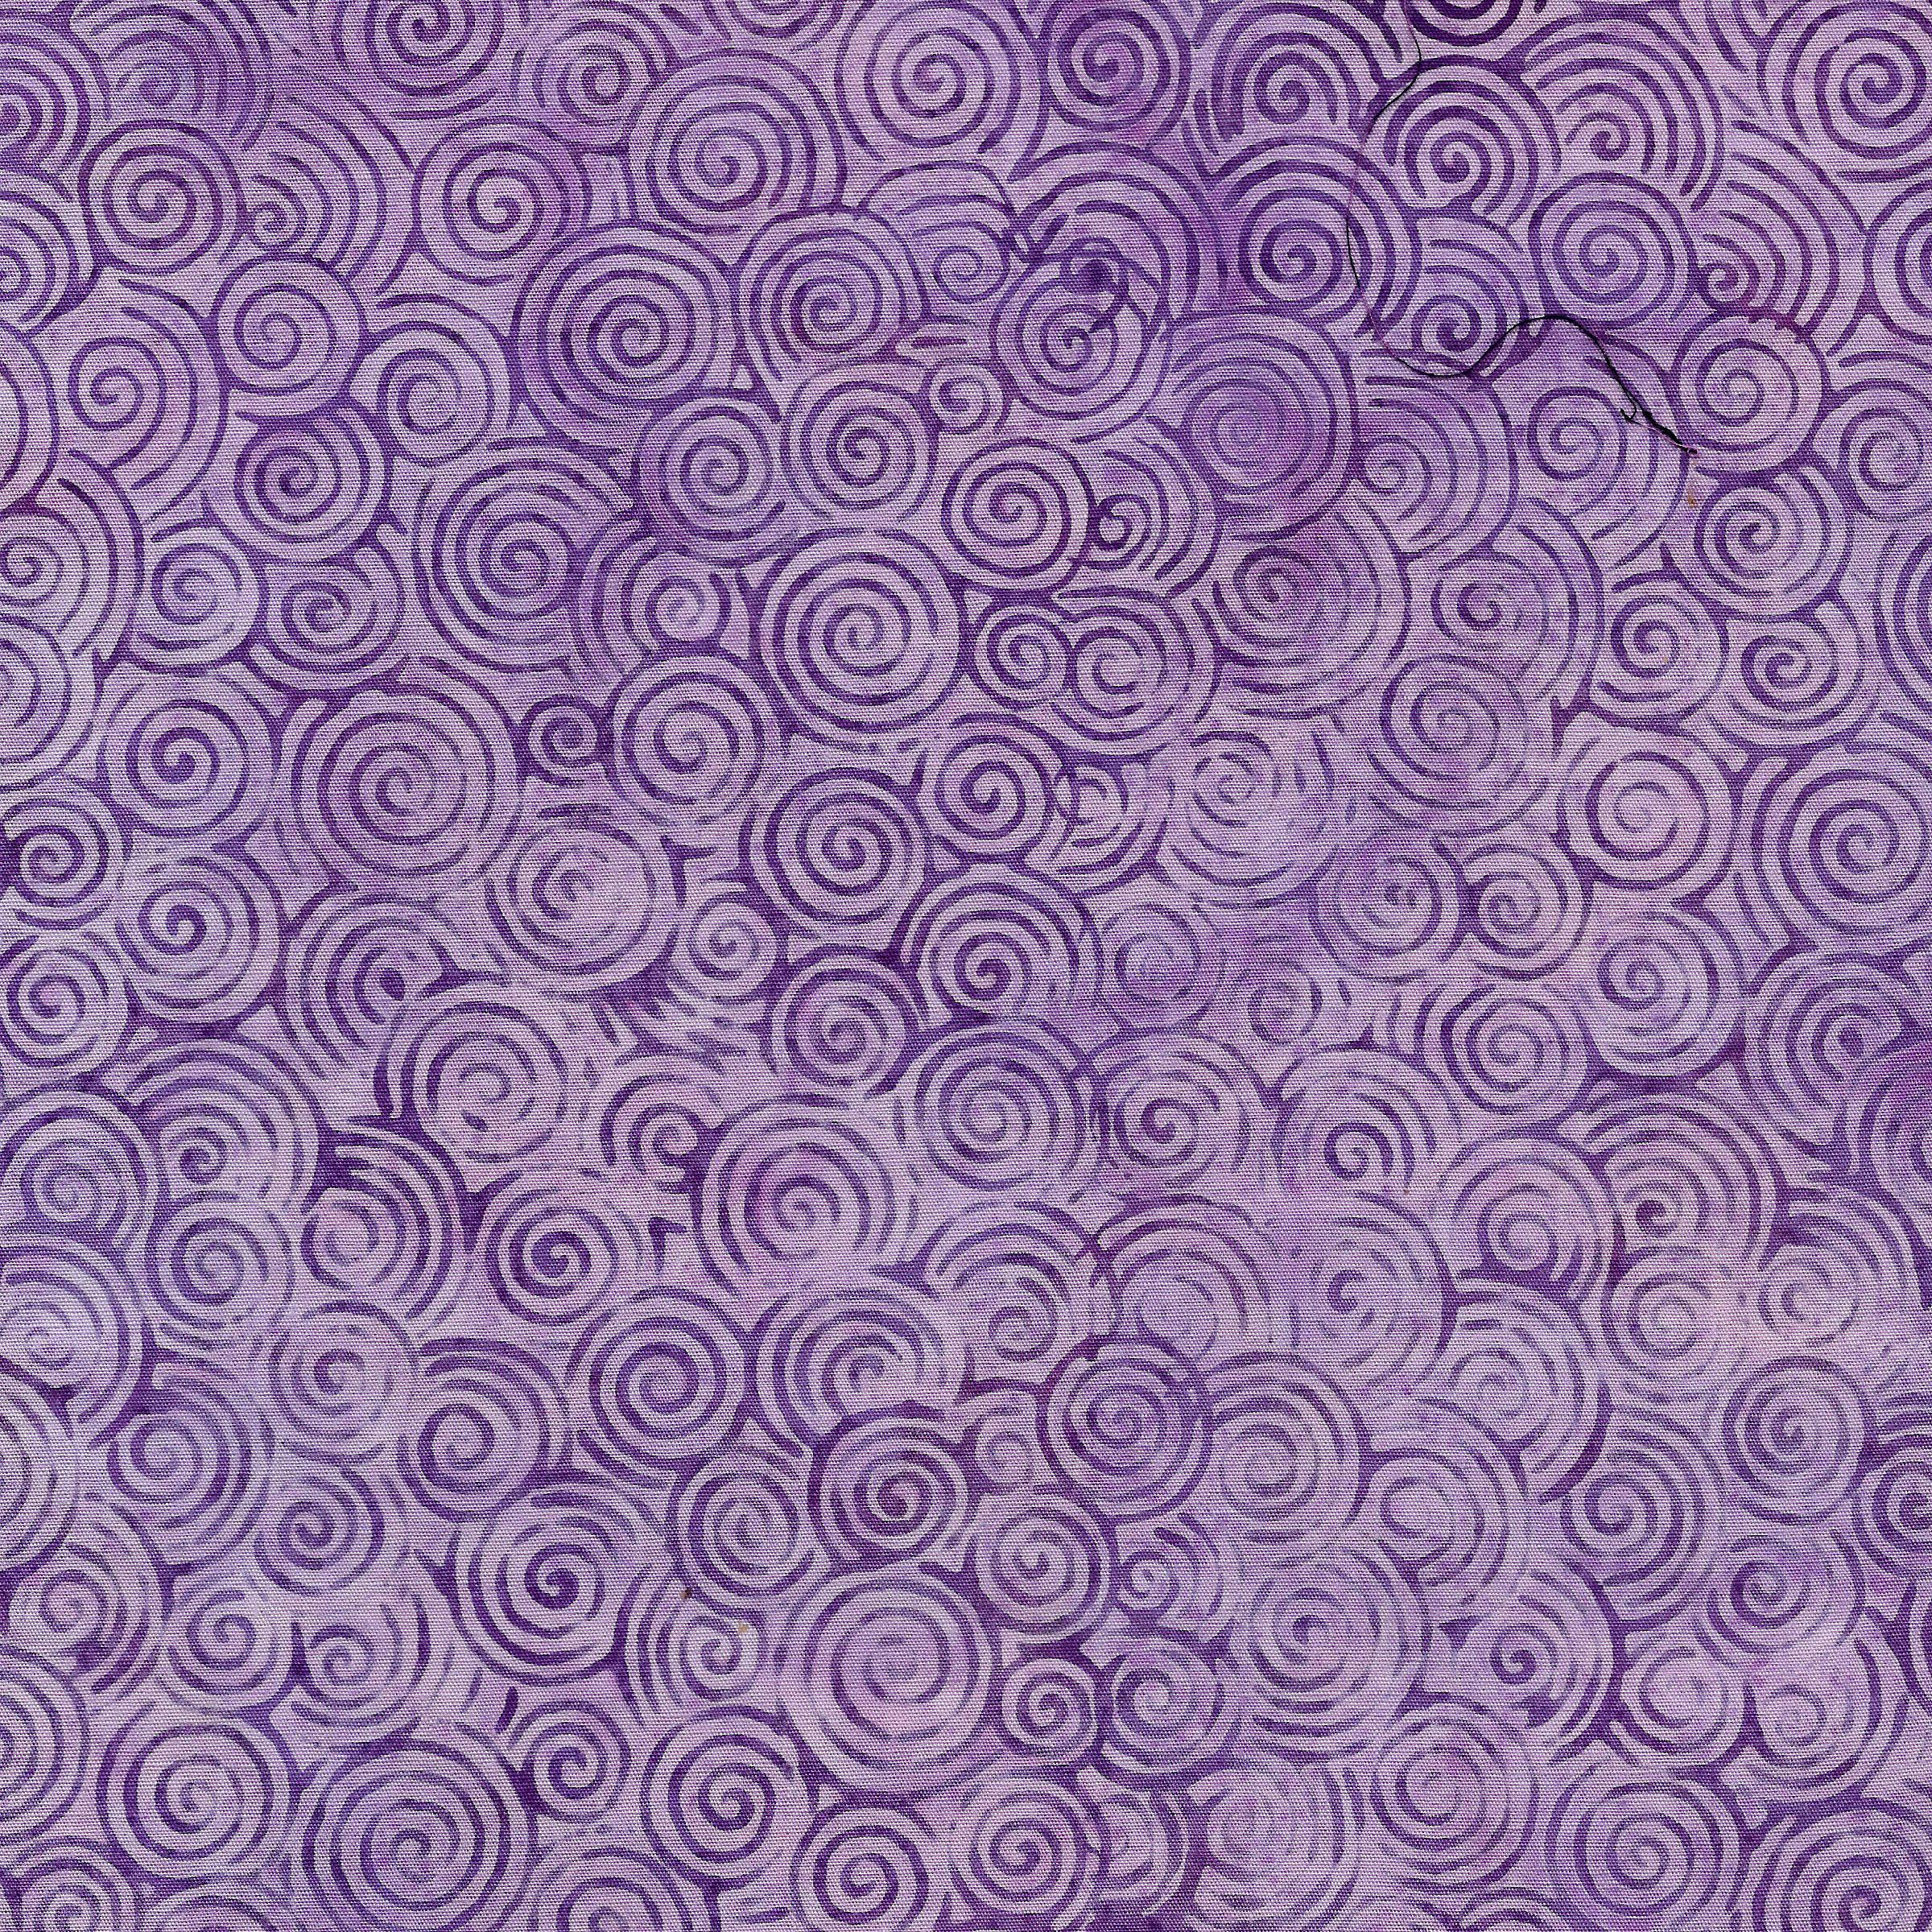 111908440 / Swirls-Wisteria